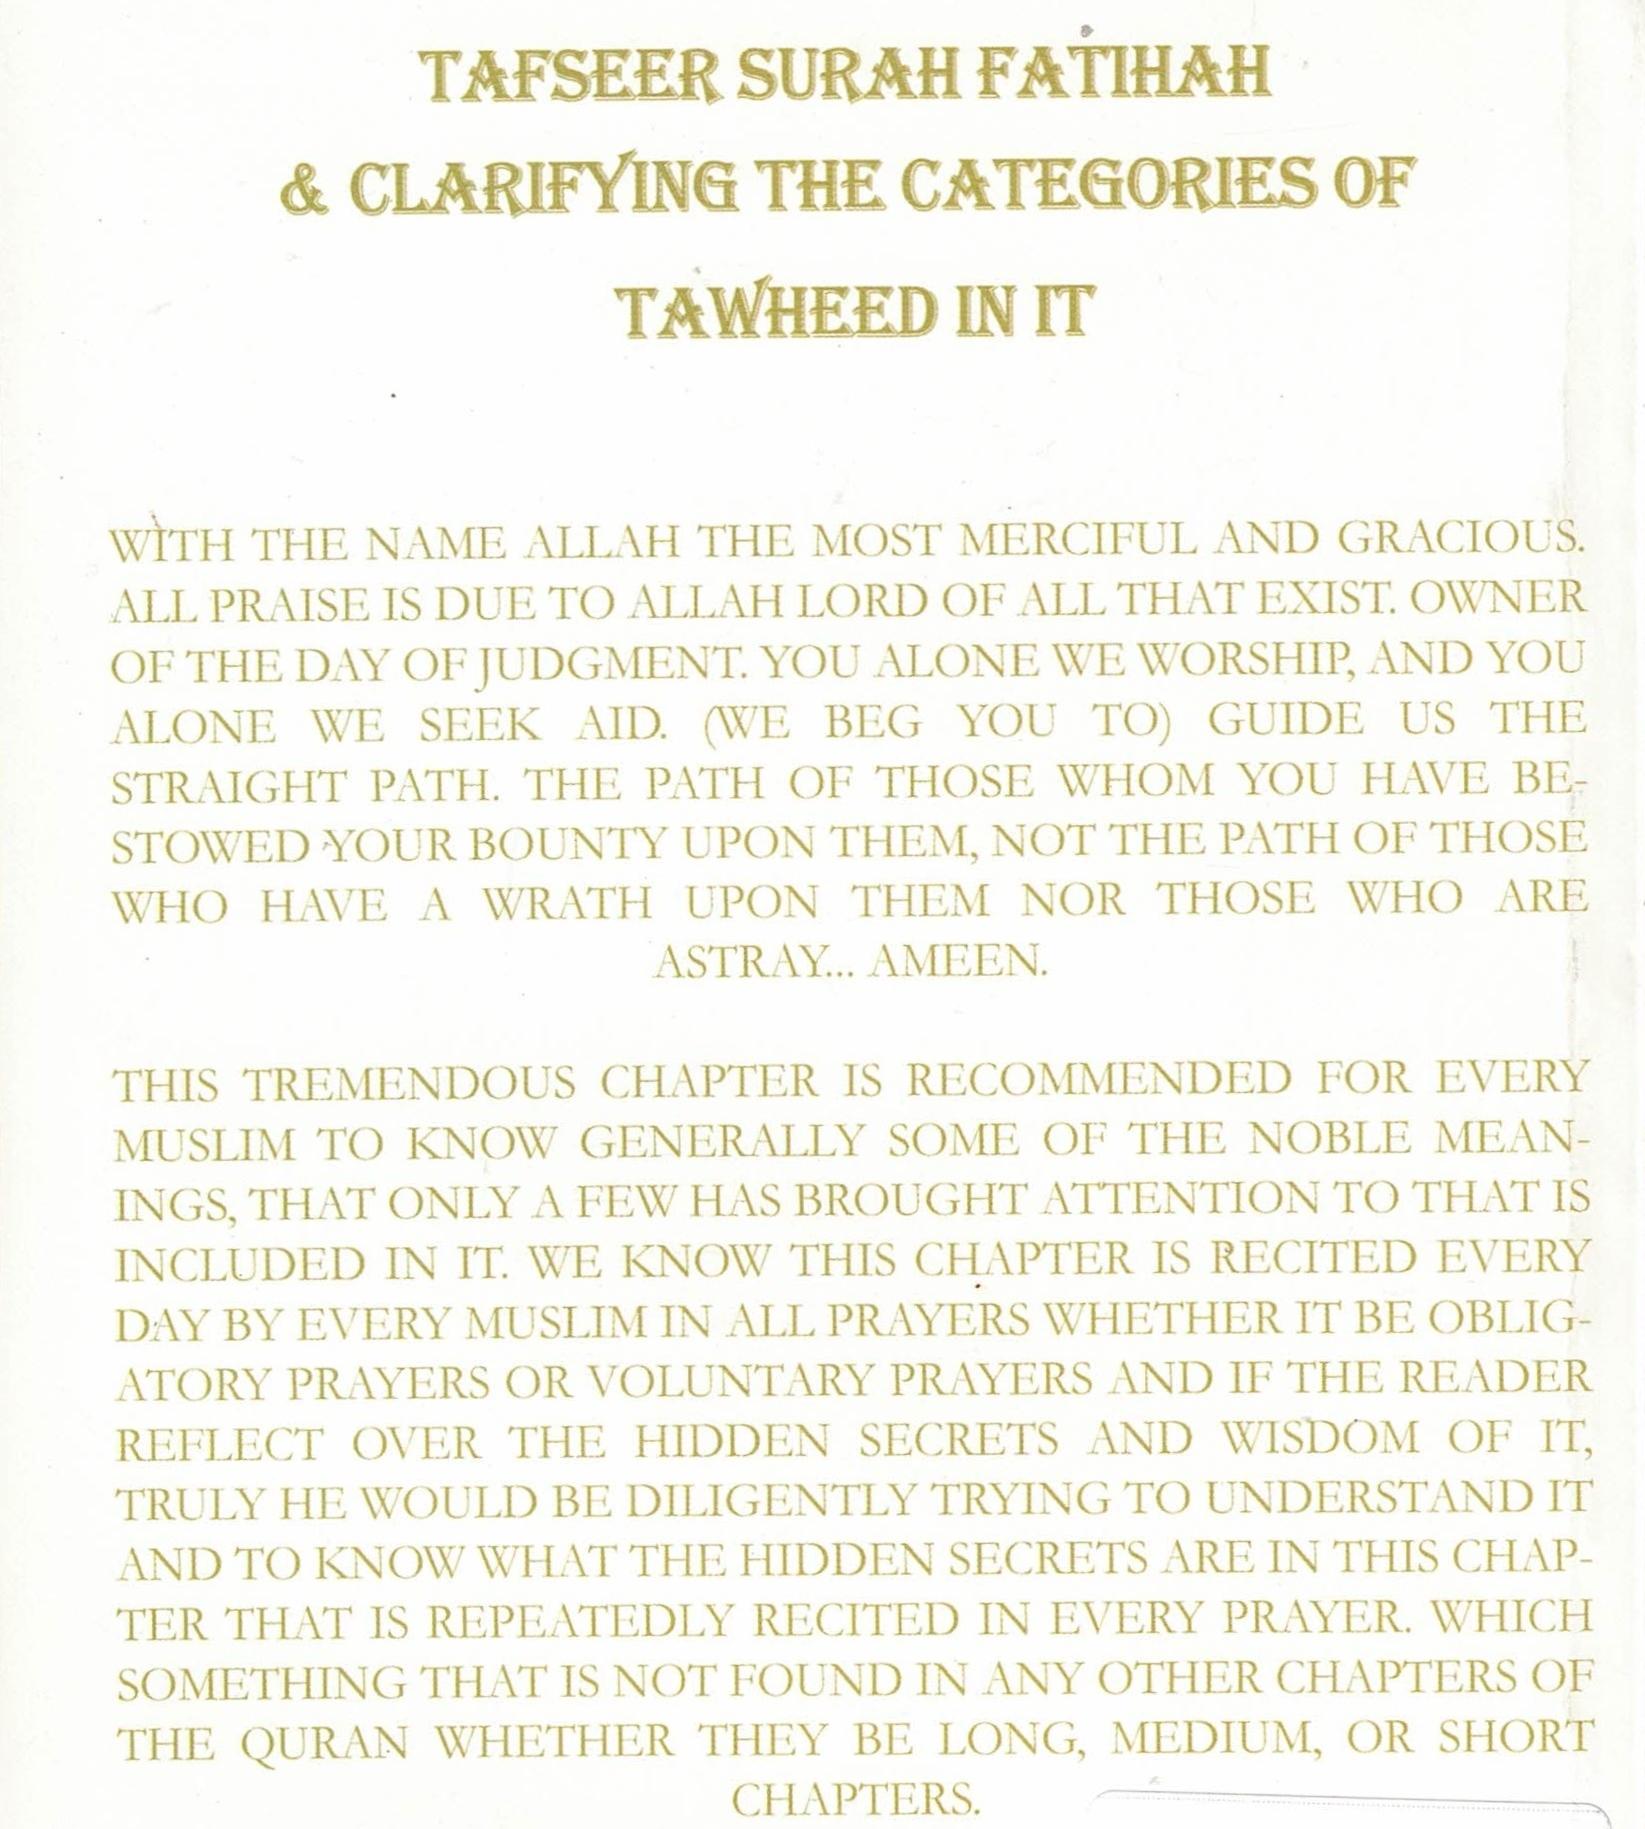 tafseer-surah-fatihah-clarifying-the-categories-of-tawheed-in-it-2-copy.jpg